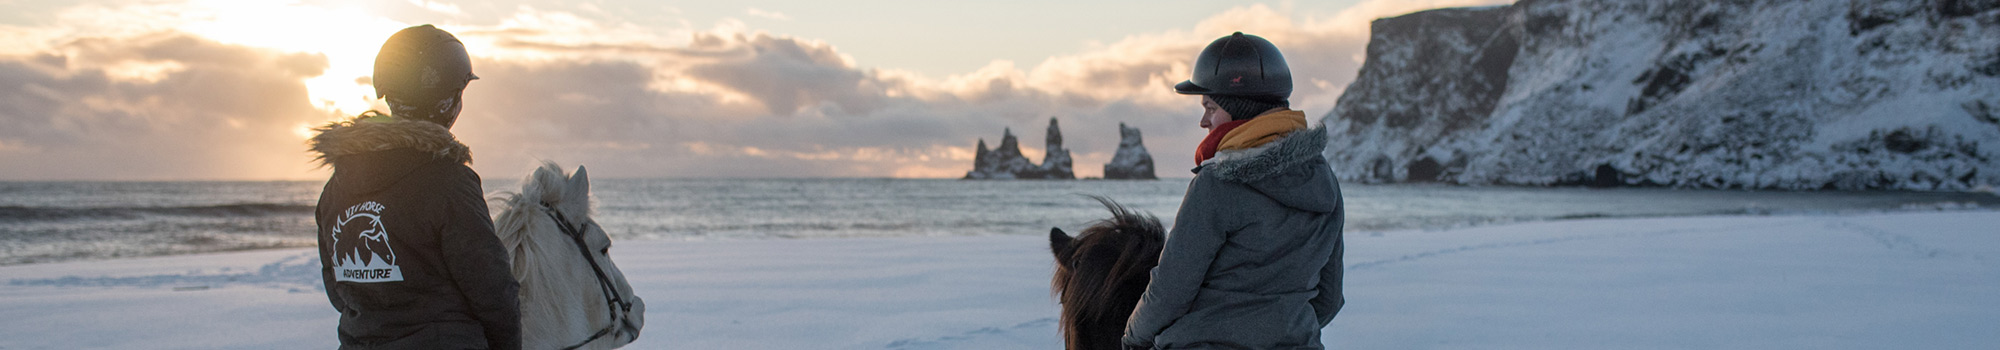 vikurdrangar spotted from horse riding tour